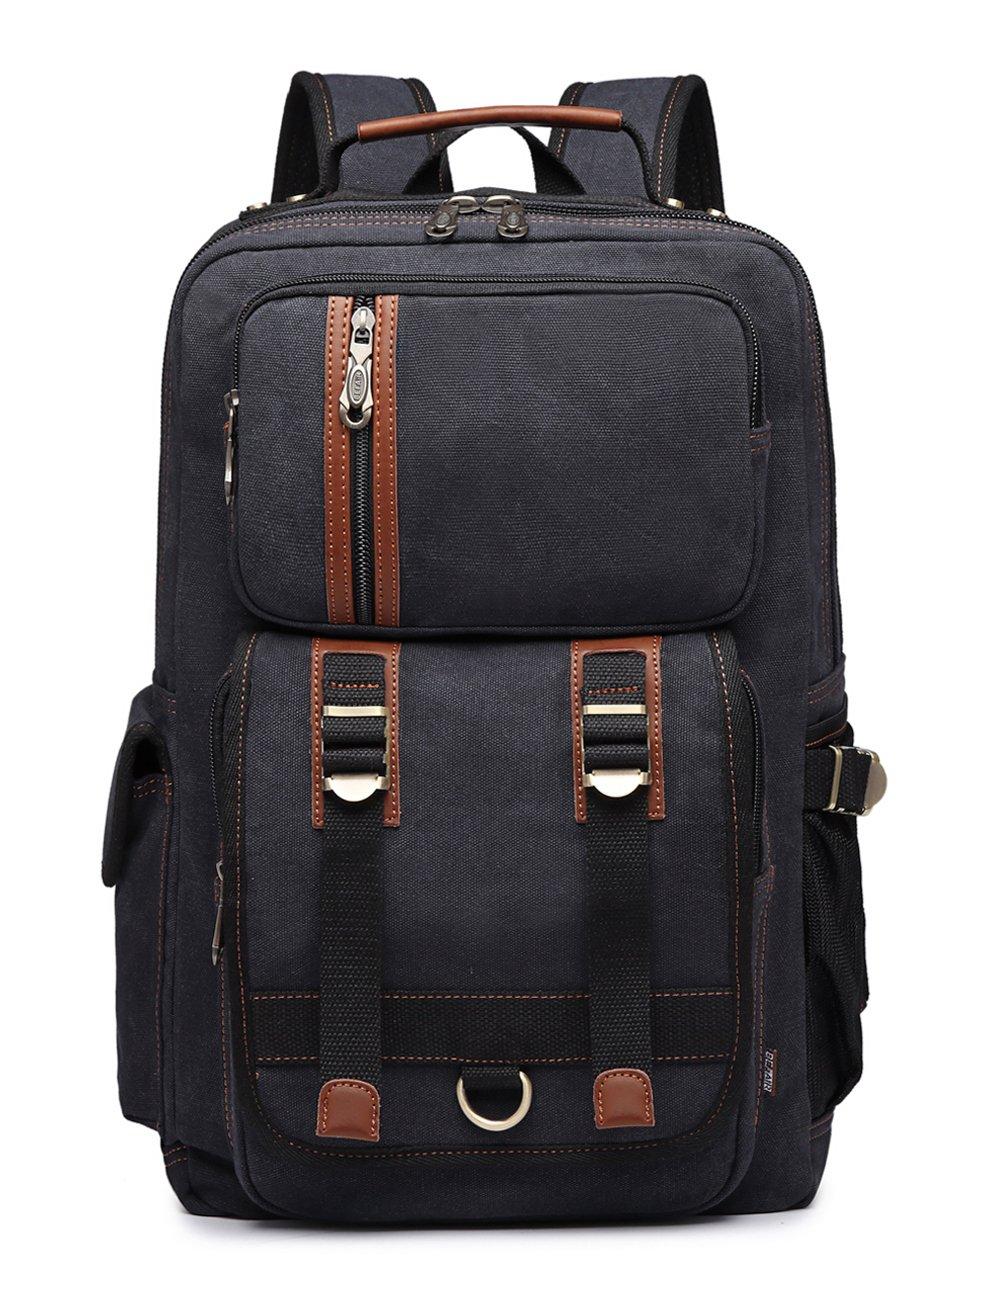 BEFAiR Canvas Backpack Vintage College Daypack Mens Laptop Backpack School Bookbag for Women Black